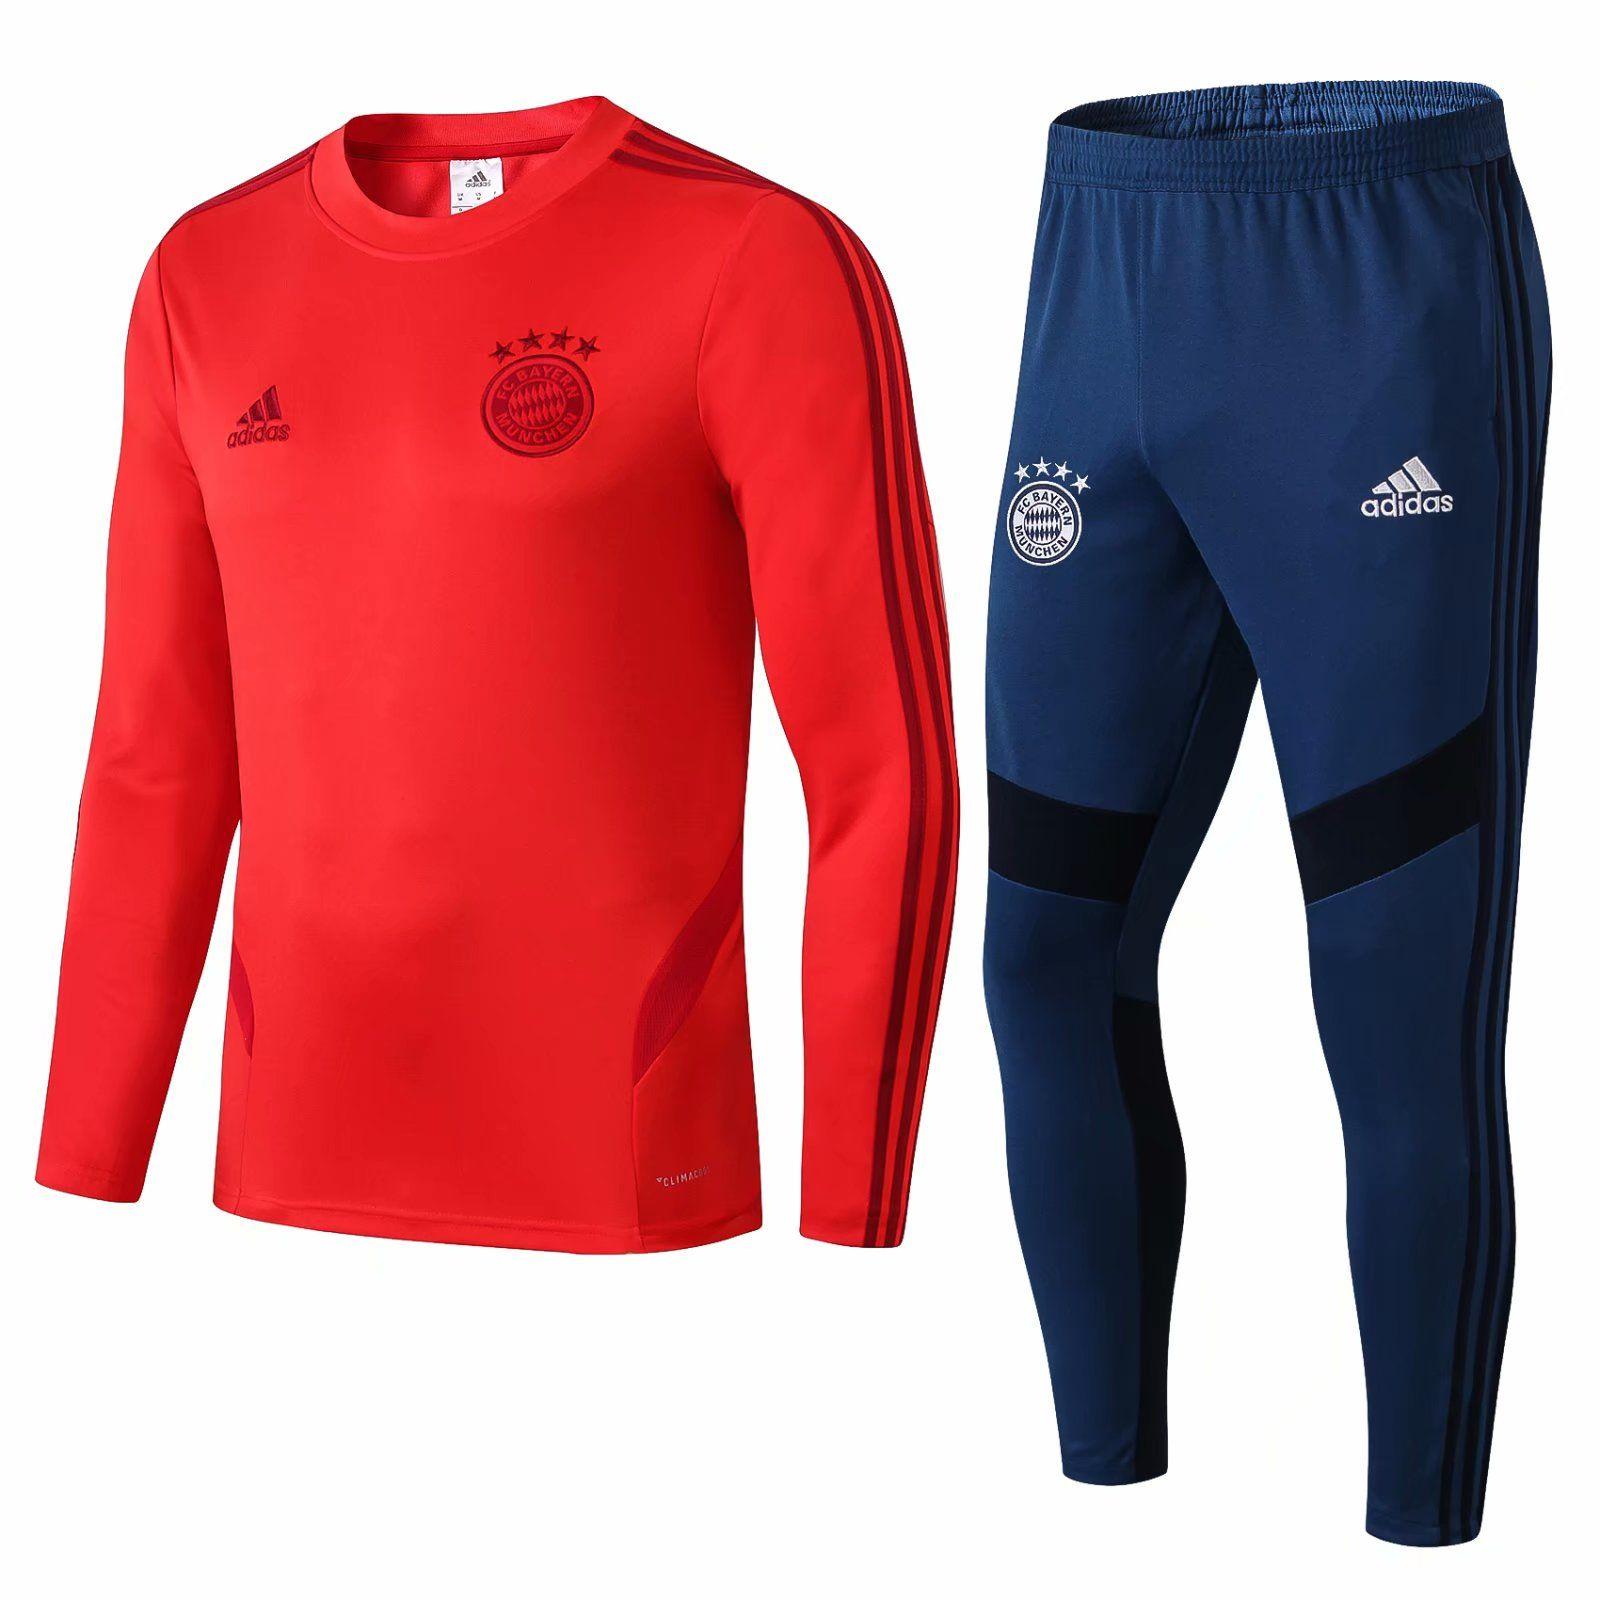 Men Borussia Dortmund Mens Sports Jersey Jacket Tracksuit Hoodie Windbreaker Sets Sporting Goods Cub Co Jp